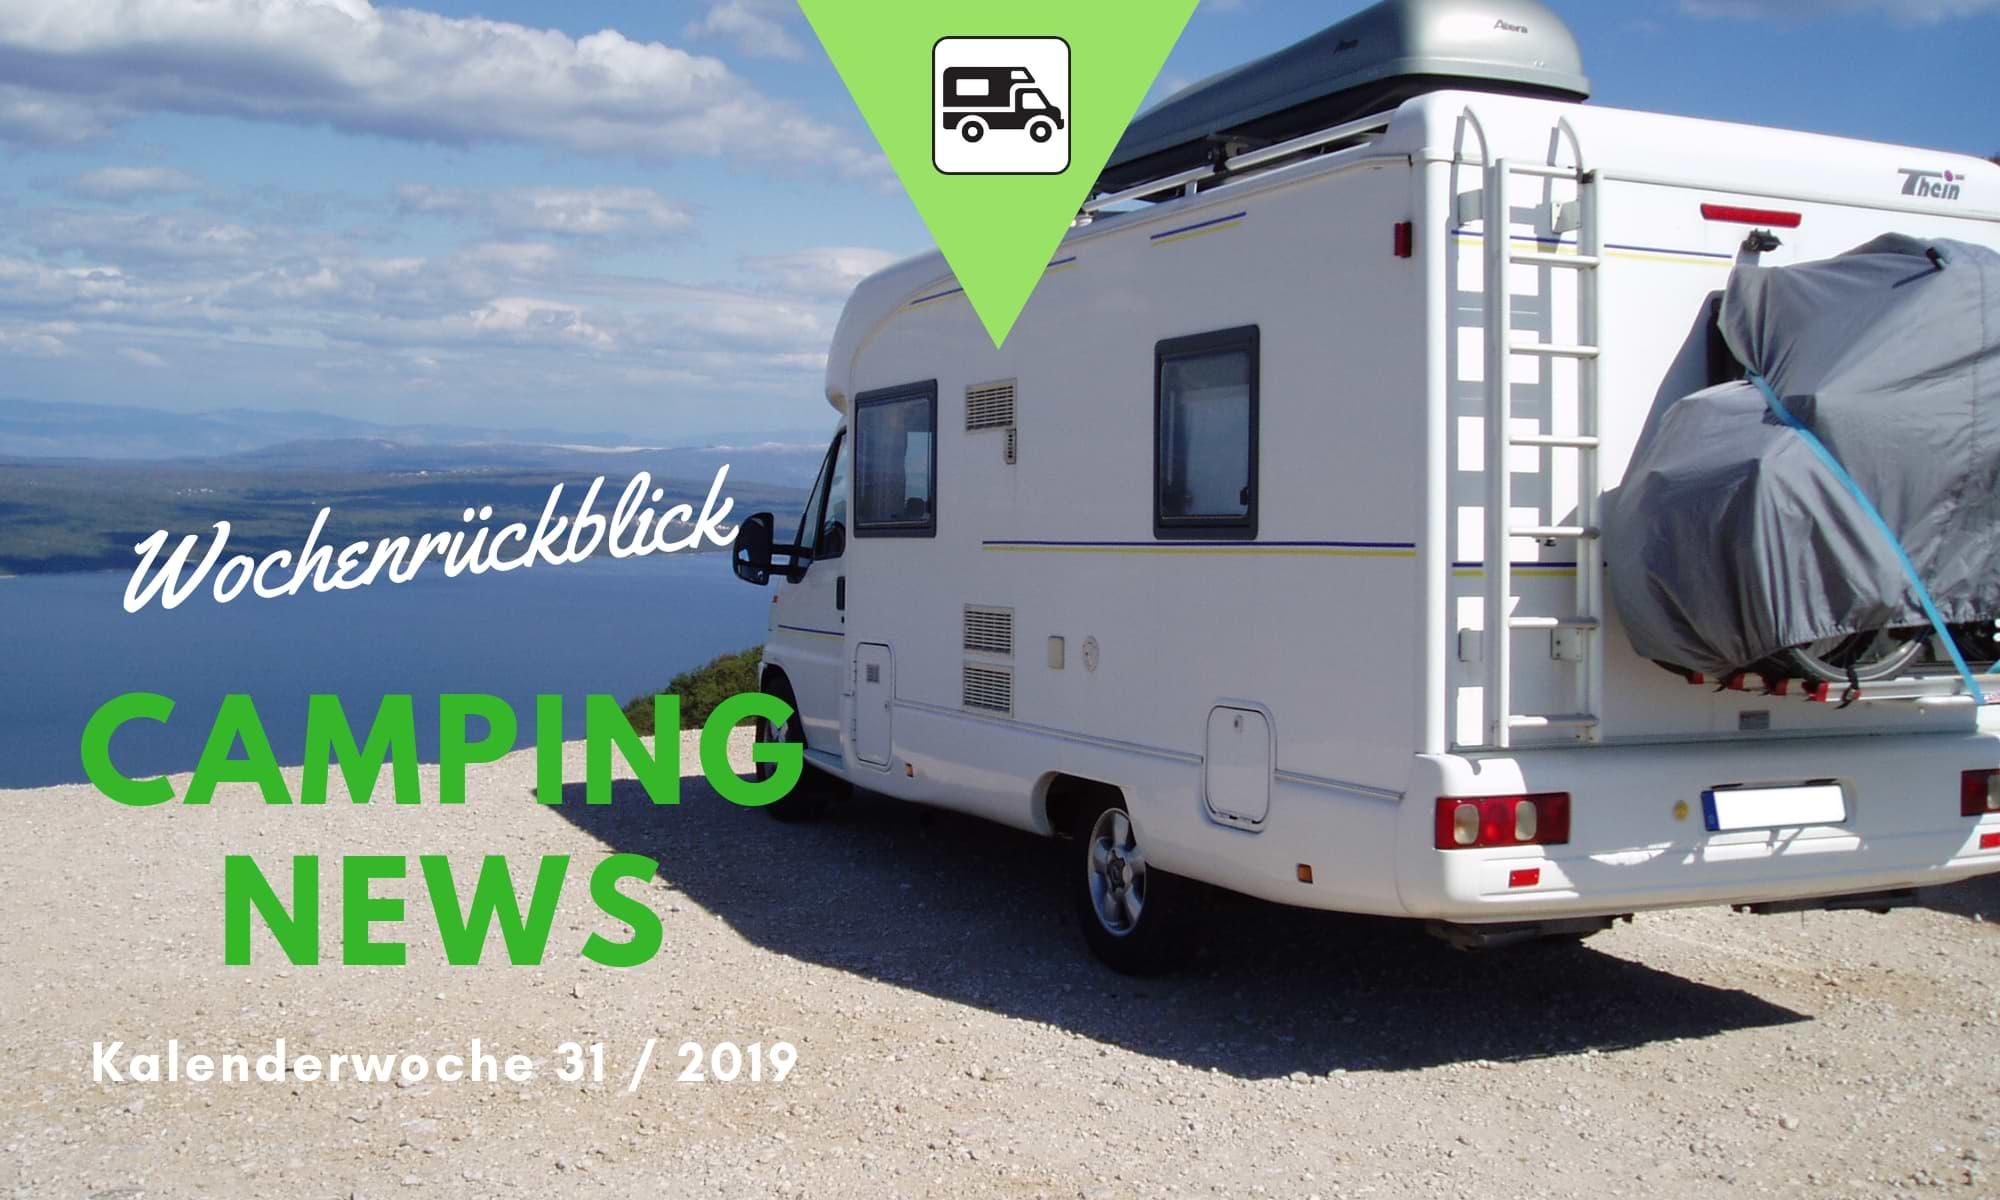 Wochenrückblick Camping News KW31-2019